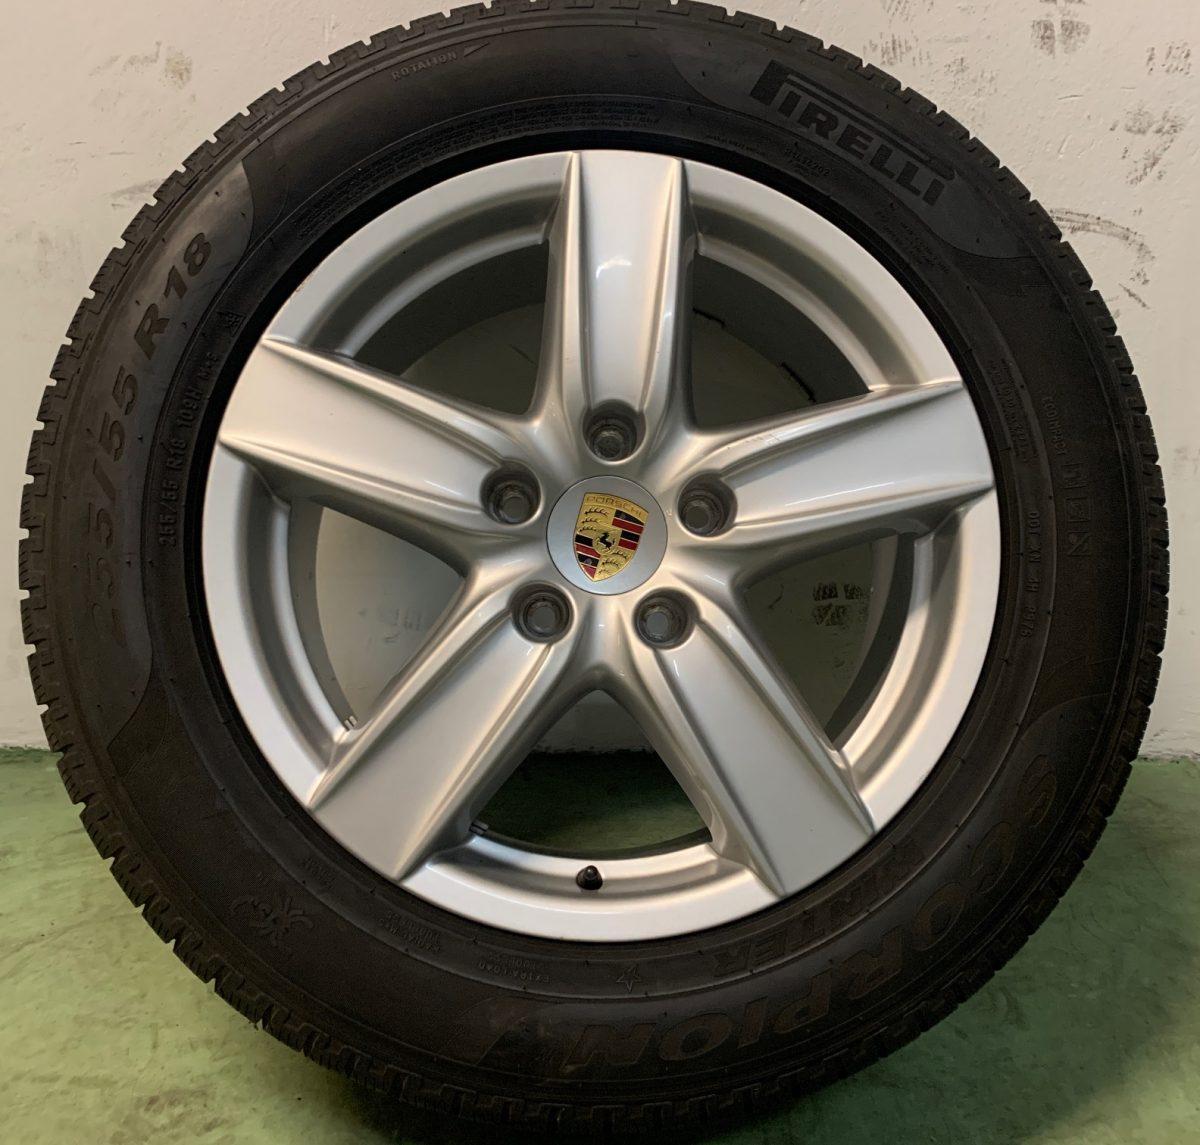 Gyári alufelni Cayenne 8X18 alufelni újszerű téli garnitúra! Pirelli gumikkal 1